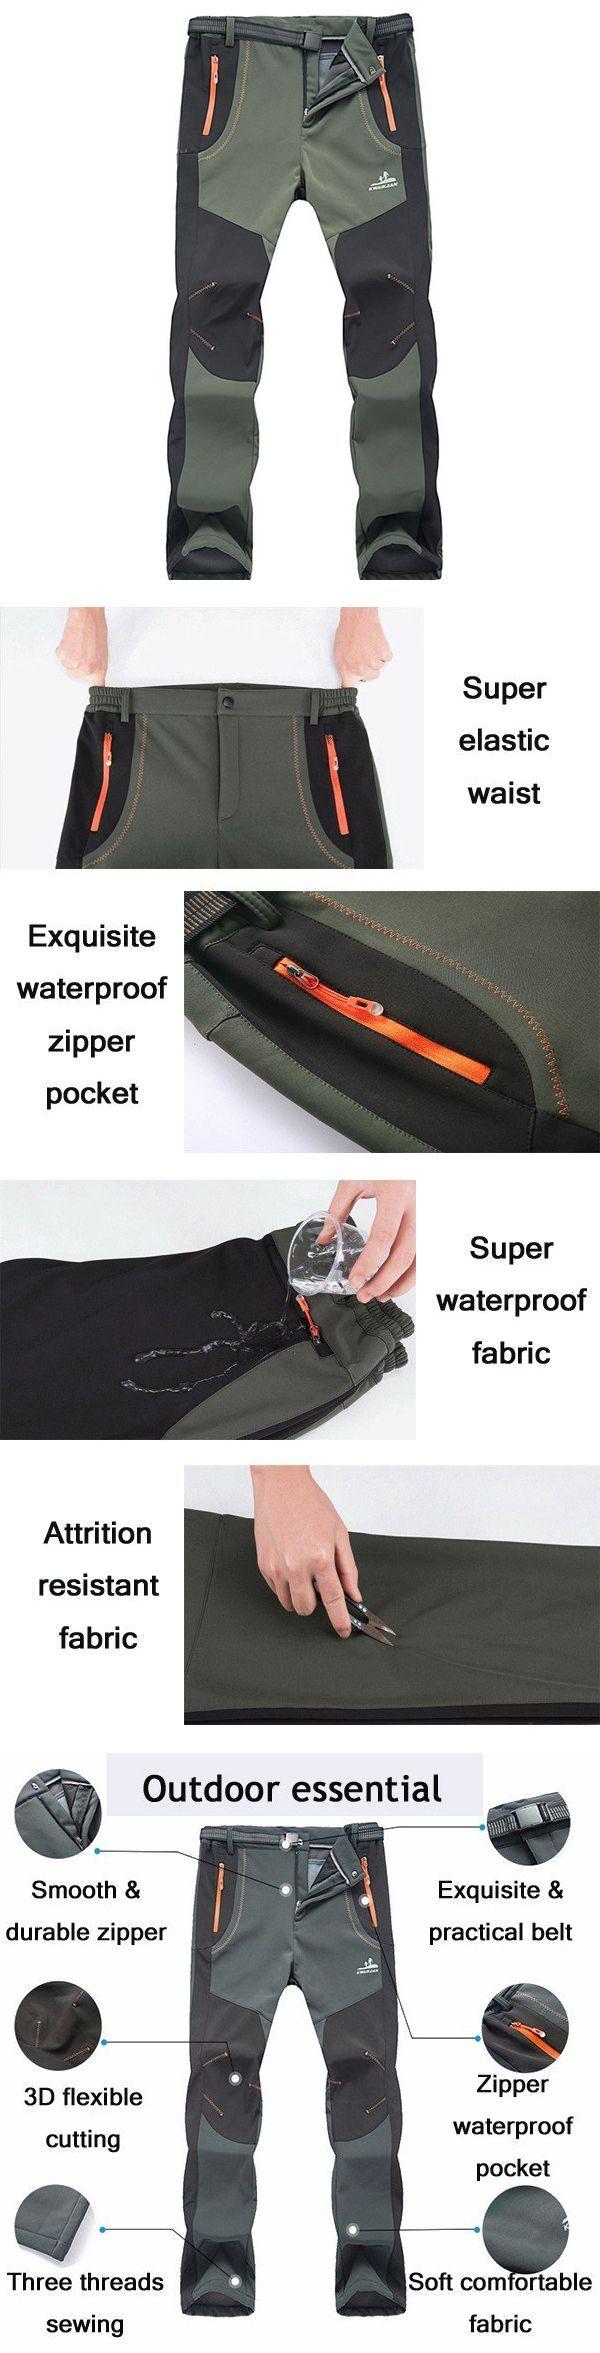 US$33.32#Mens Outdoor Sport Pants Elastic Waist Soft Shell Warm Fleece Lining Waterproof Quick-Dry Trouser